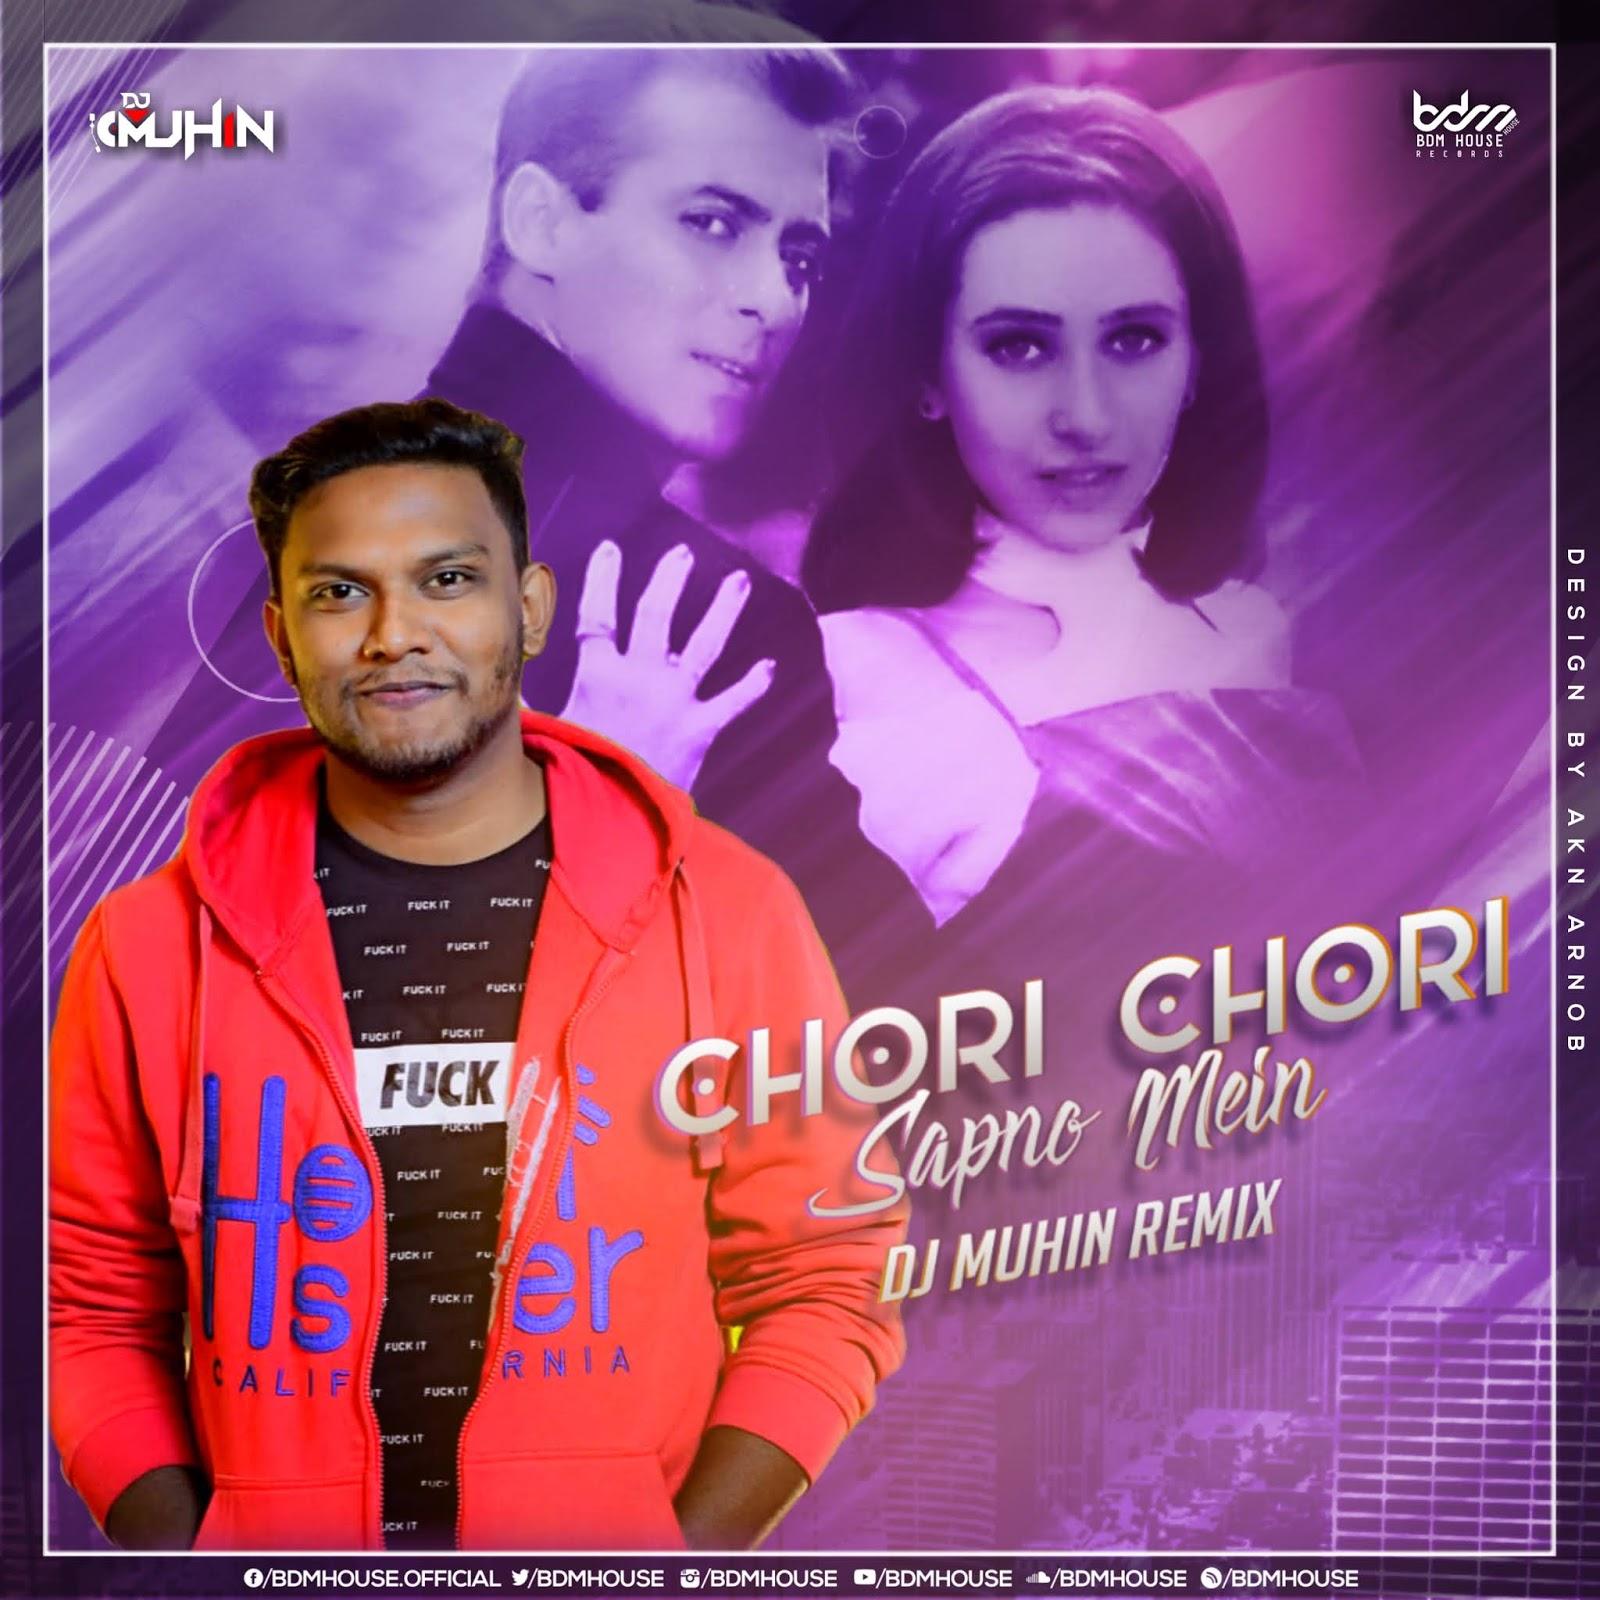 Chori Chori Sapno Main (Remix) - DJ MUHIN BY BDM HOUSE RECORDS